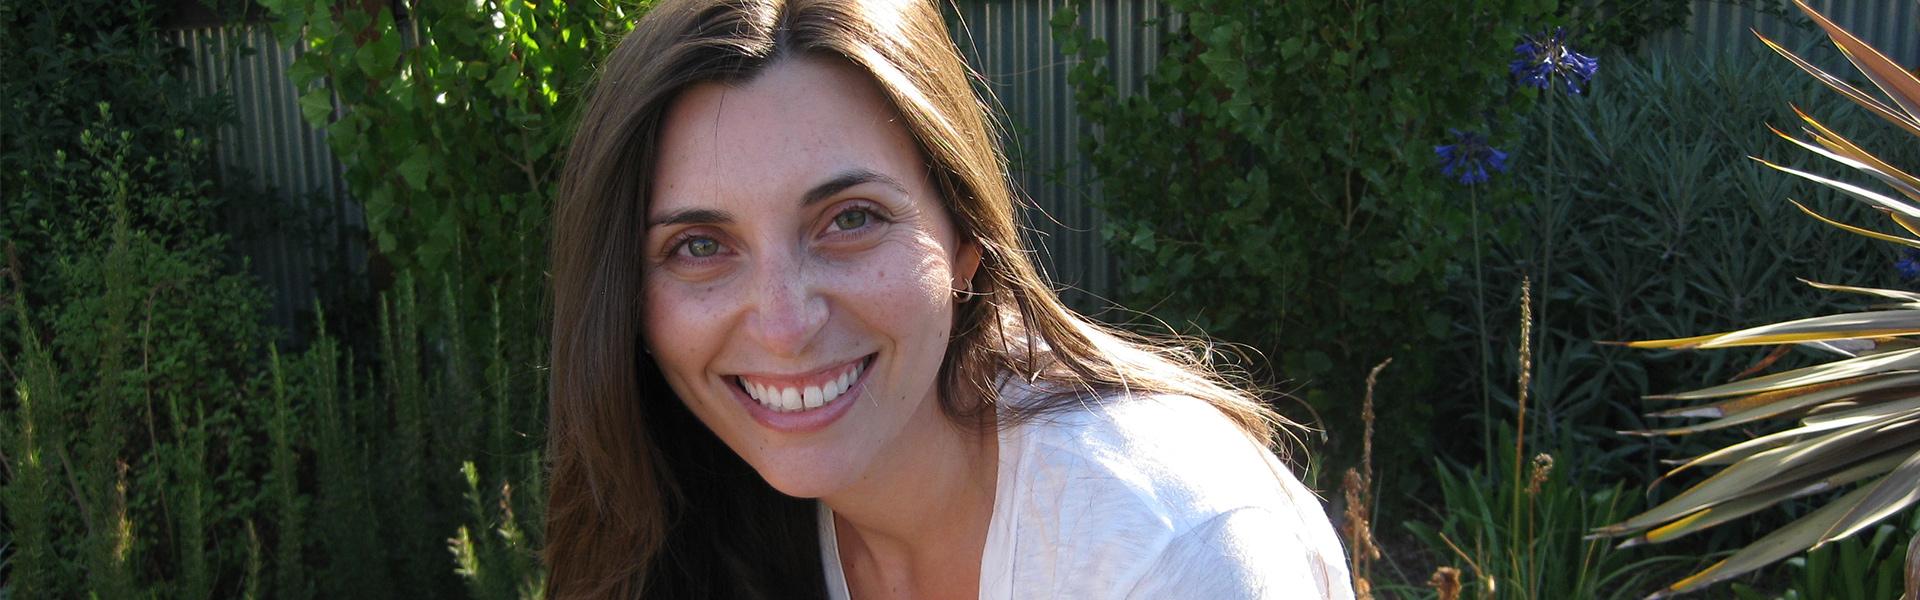 Alyssa Sheinmel: Exploring Self-Acceptance in YA Books